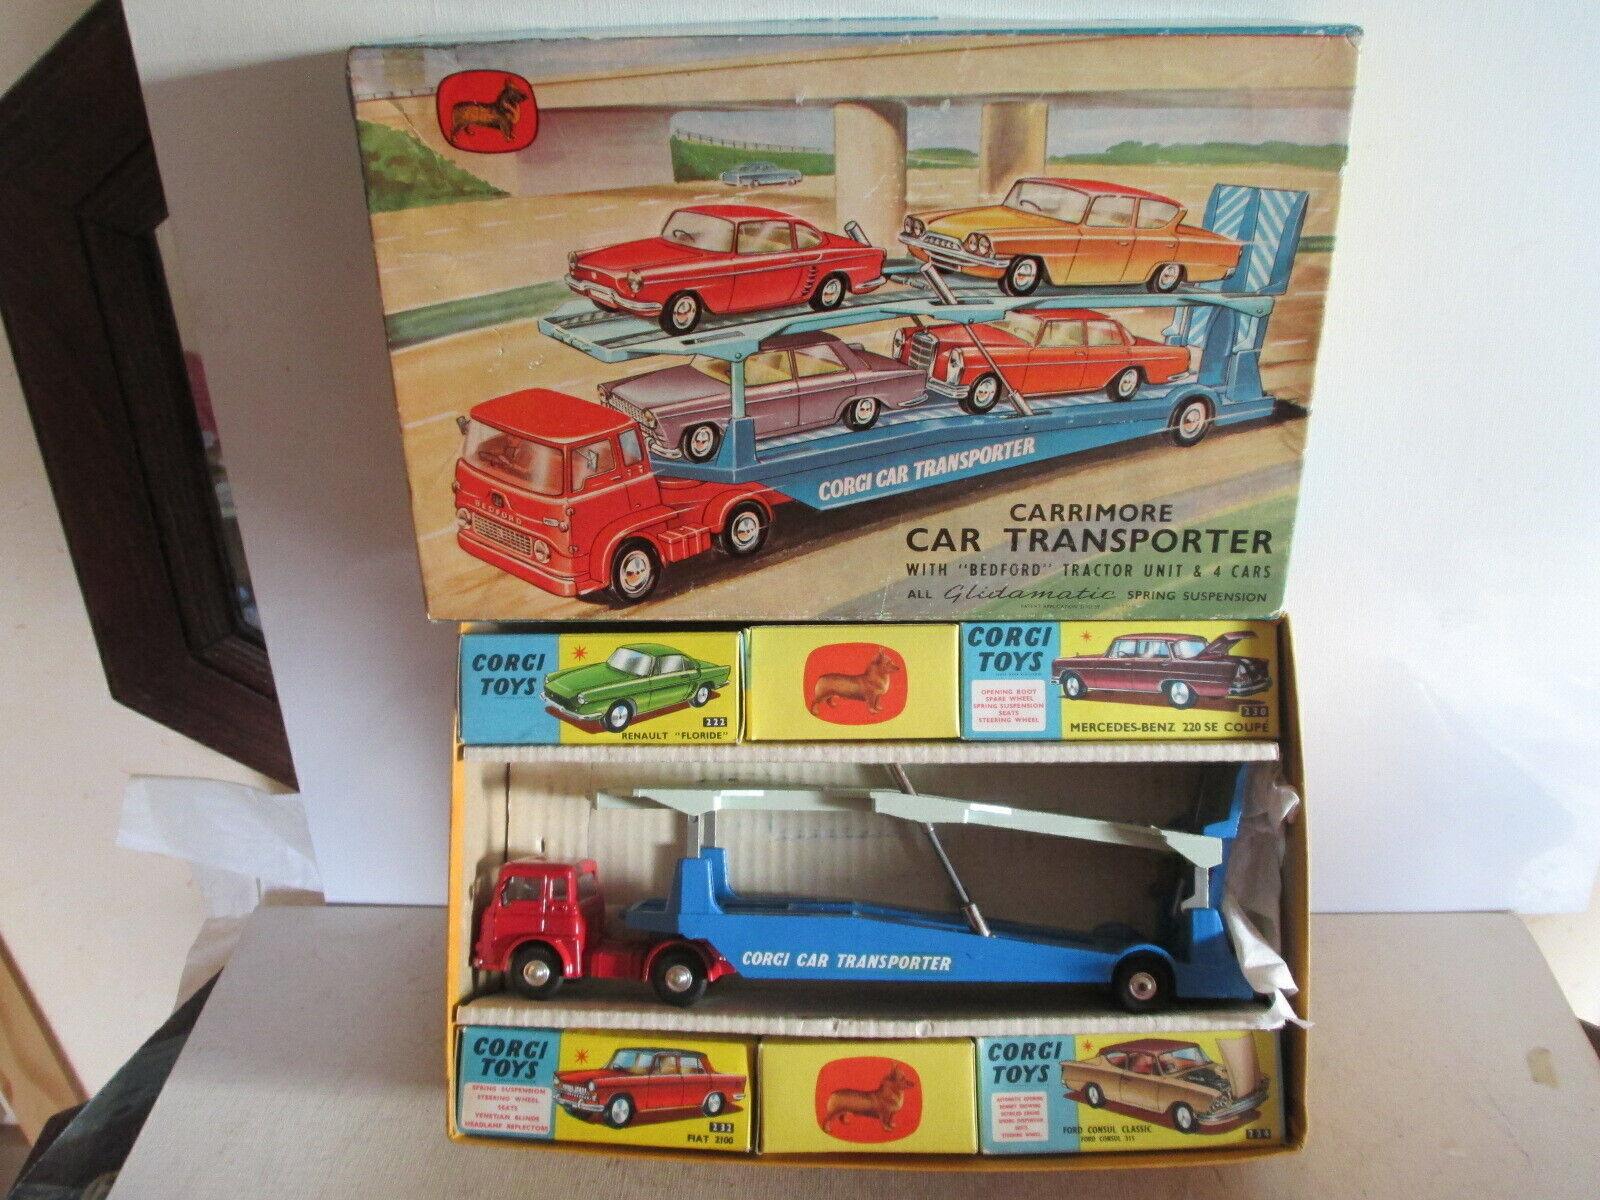 CORGI GIFT SET 28 GS28 BEDFORD TK auto TRANSPORTER COFFRET CADEAU 28 SO NICE L@@K